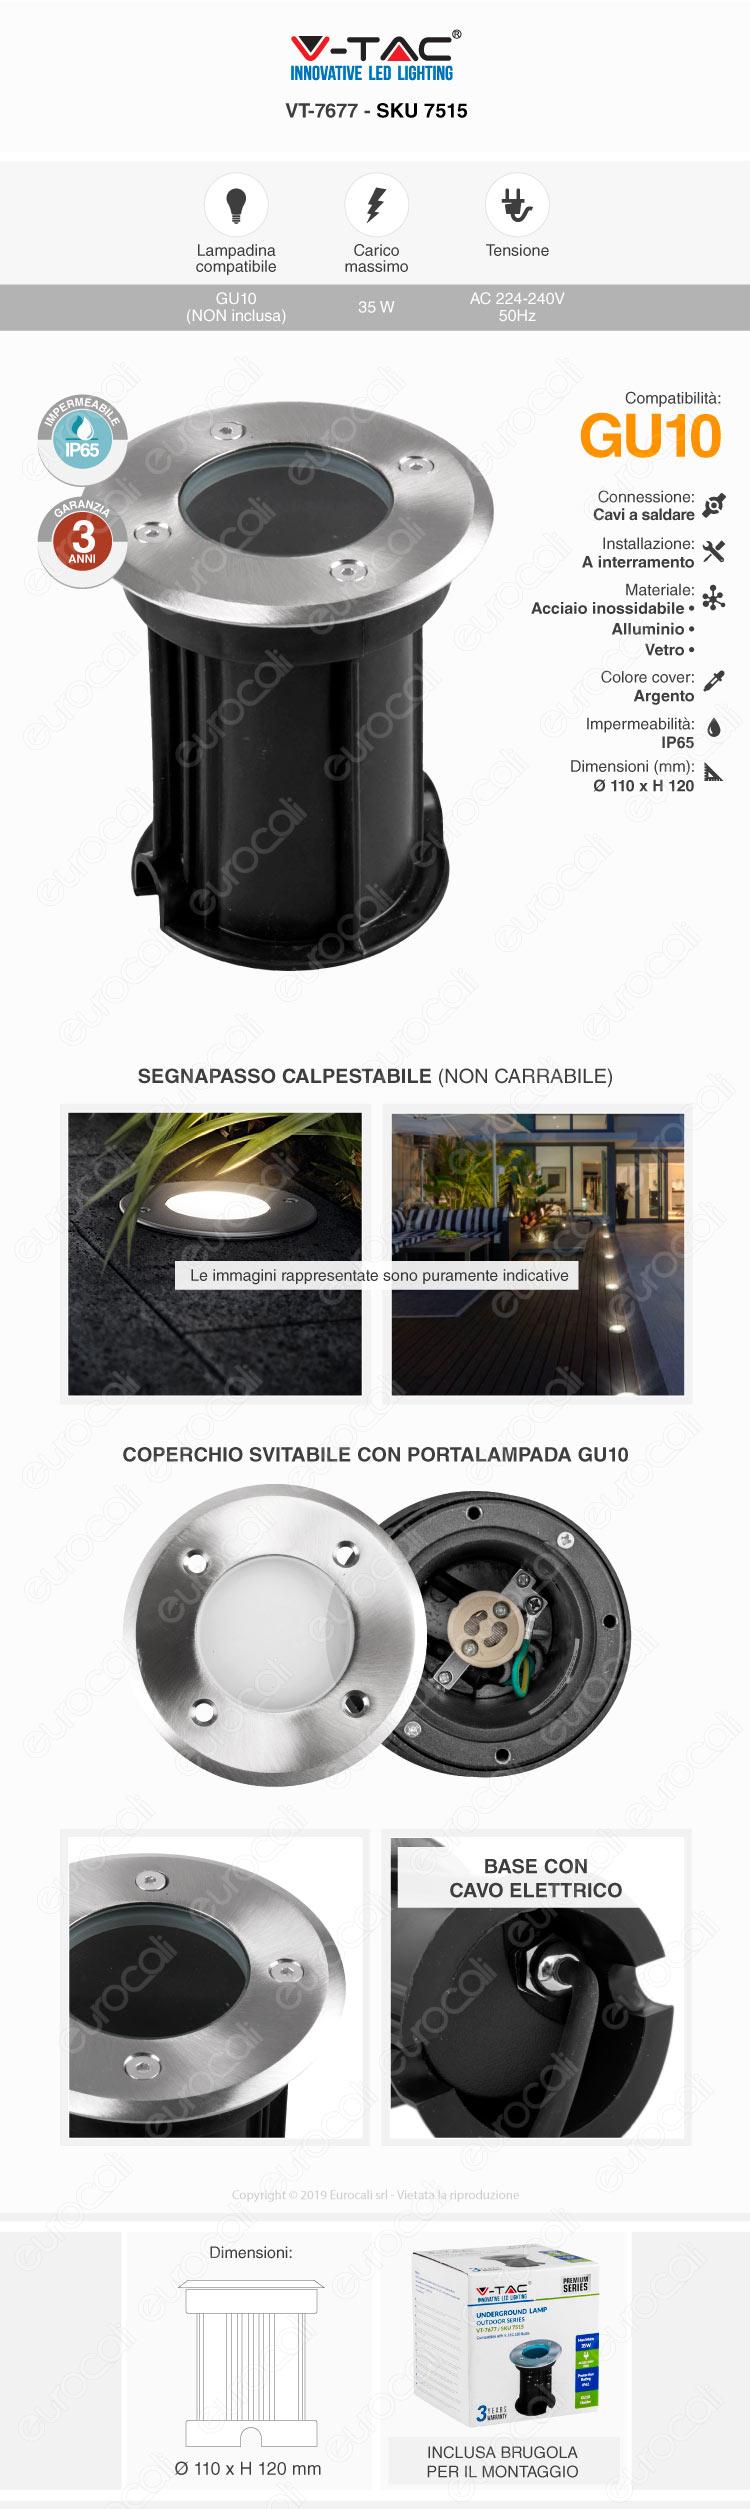 Portalampada GU10